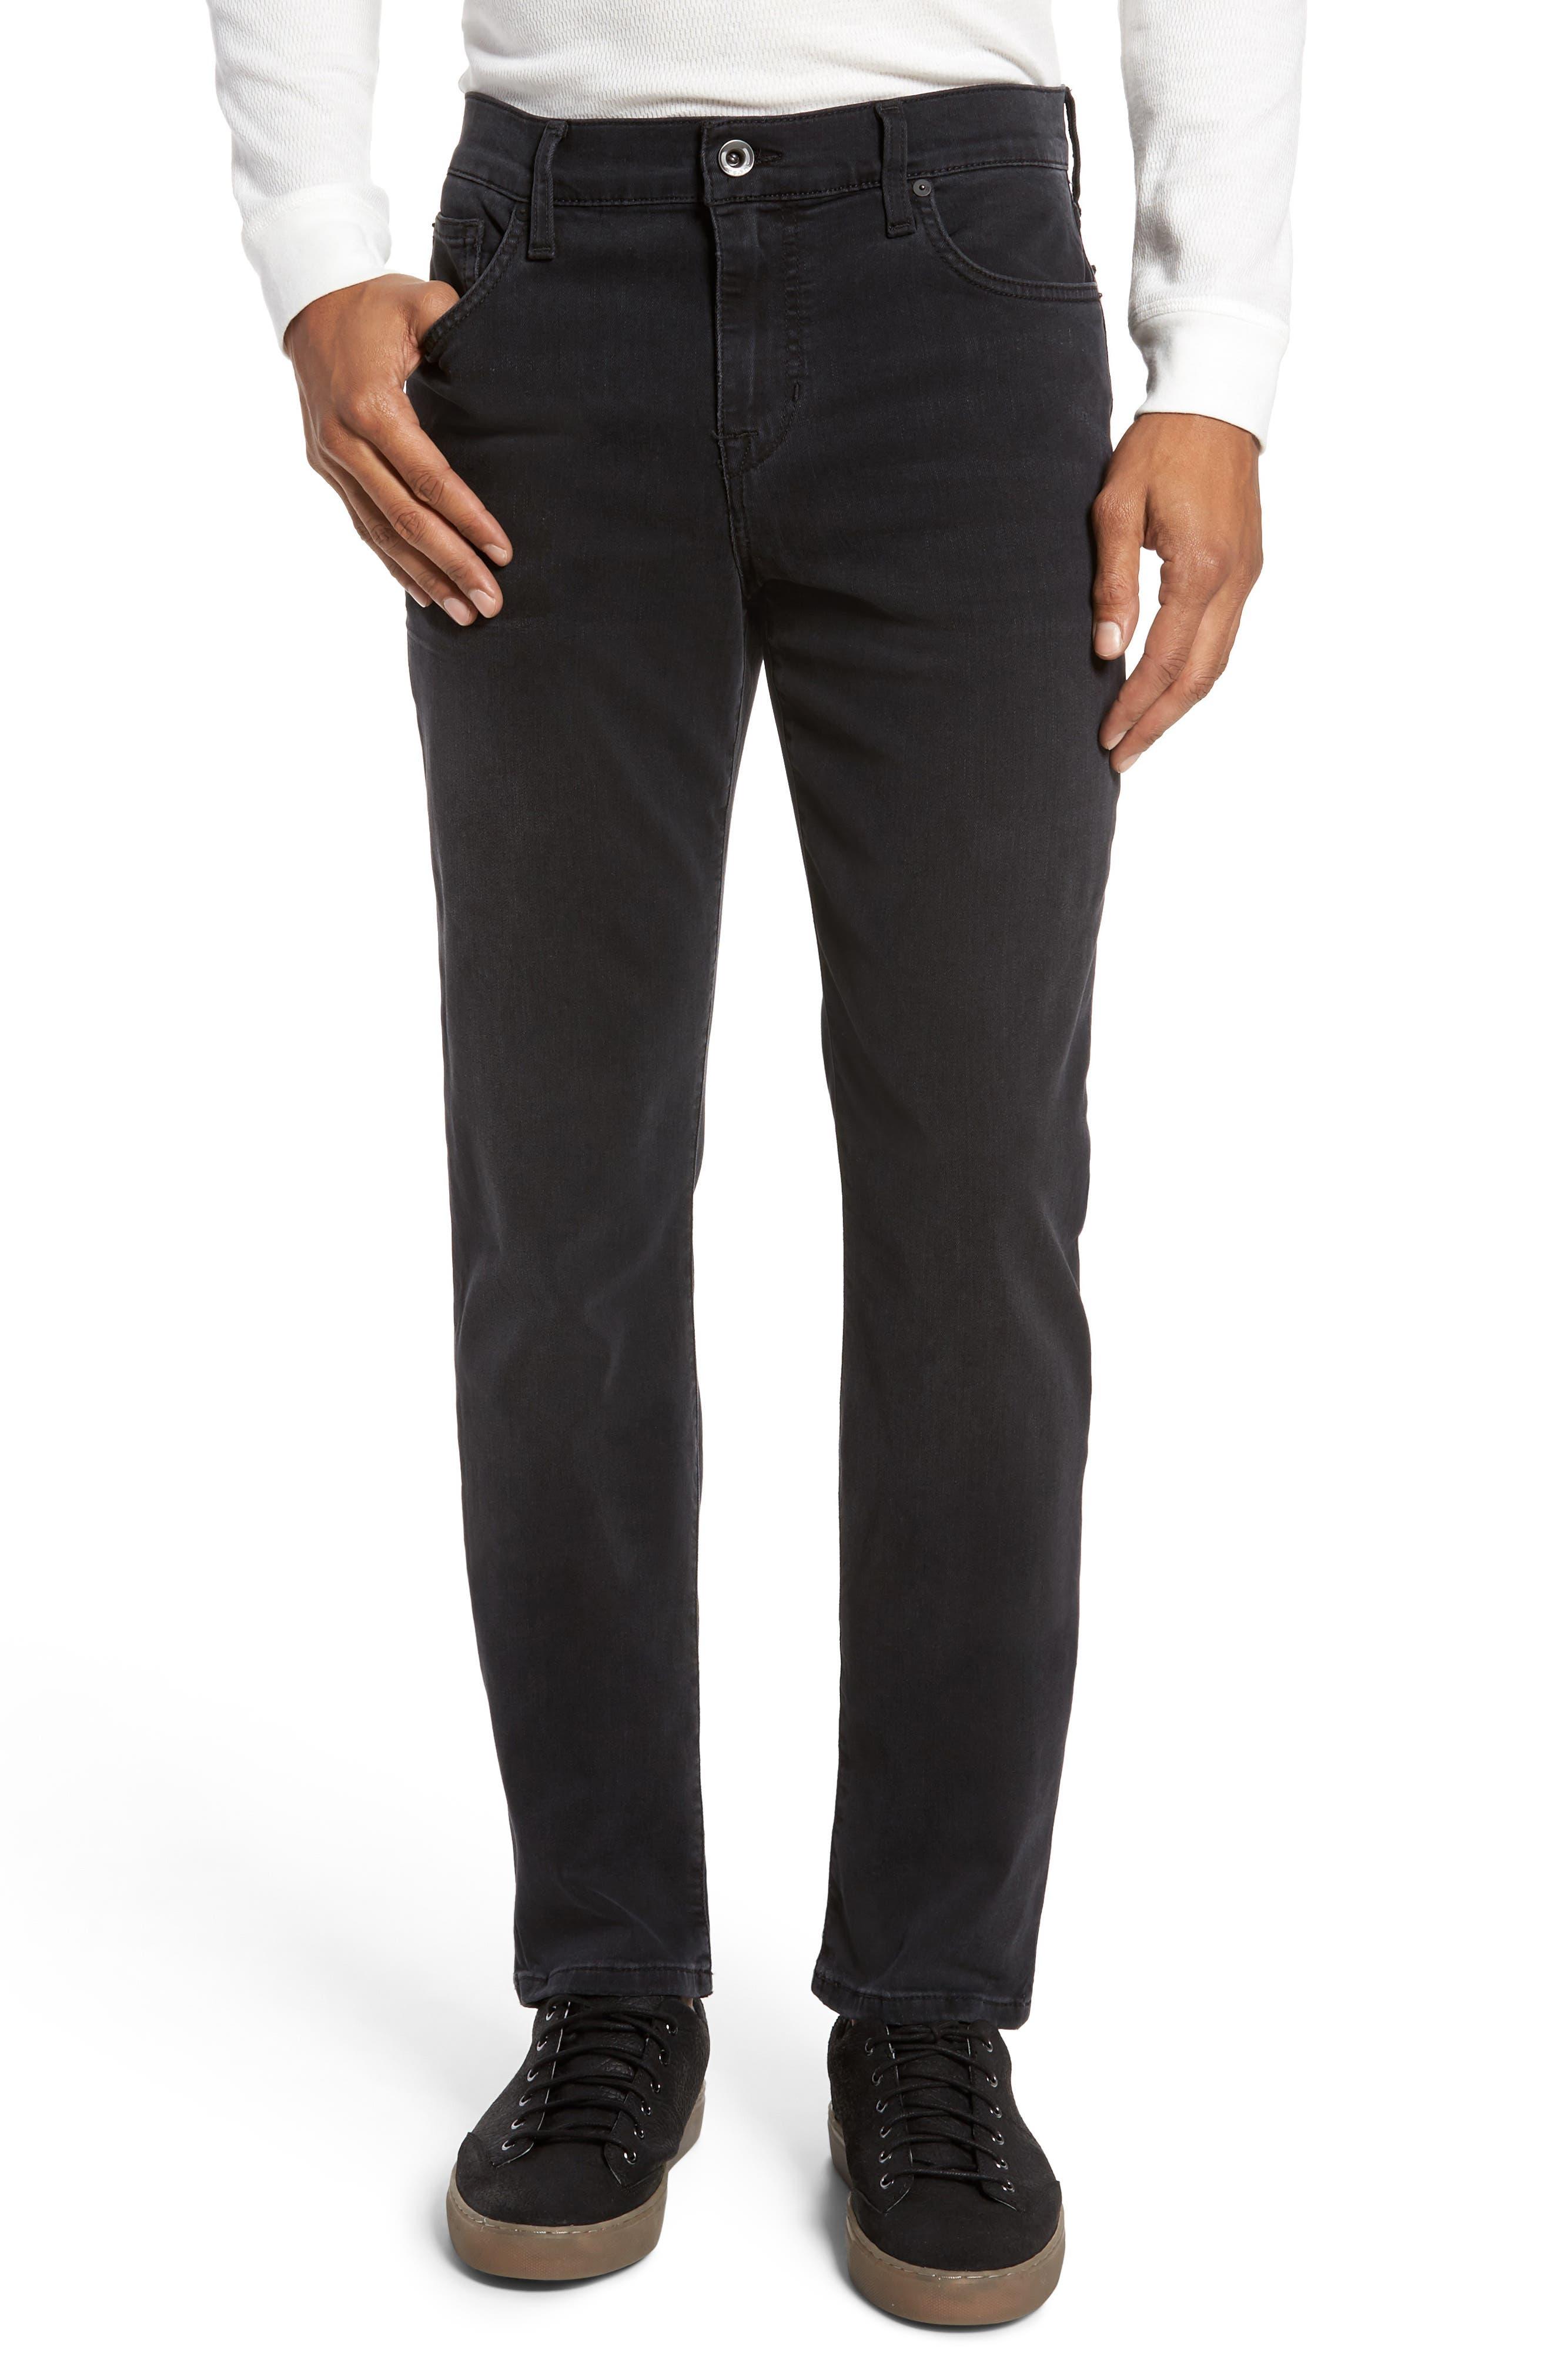 Alternate Image 1 Selected - Joe's Slim Fit Jeans (Beldon)